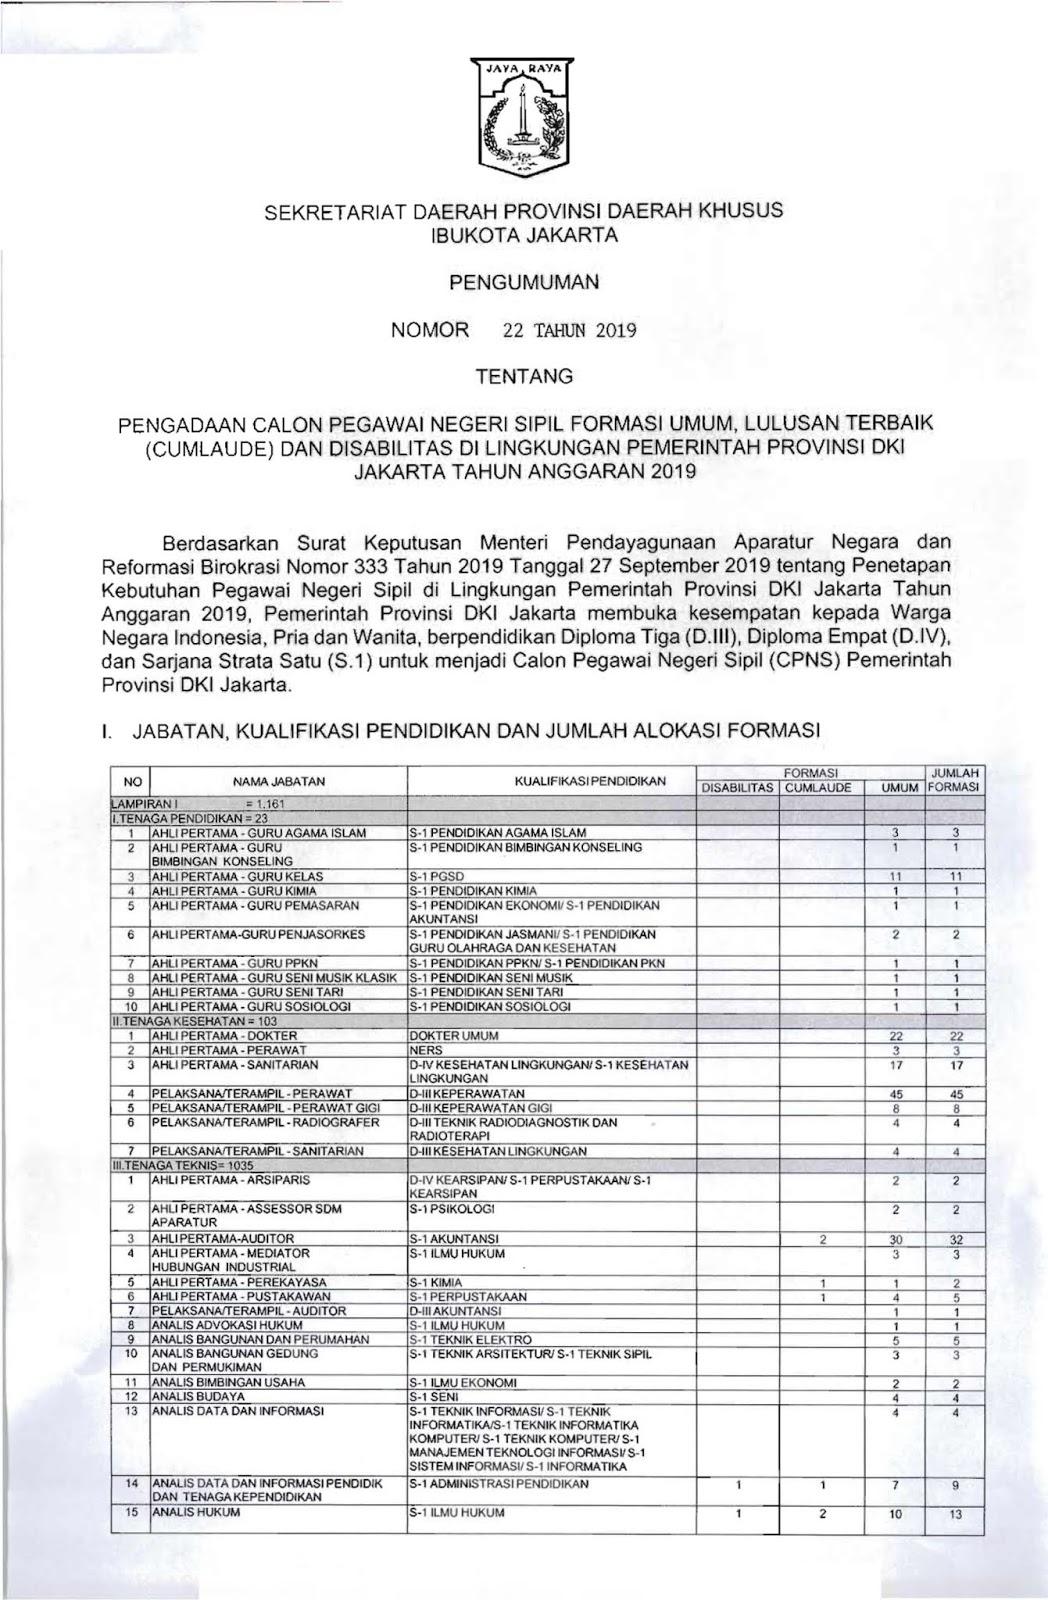 Lowongan CPNS Provinsi DKI Jakarta Tahun Anggaran 2019 [3958 Formasi]